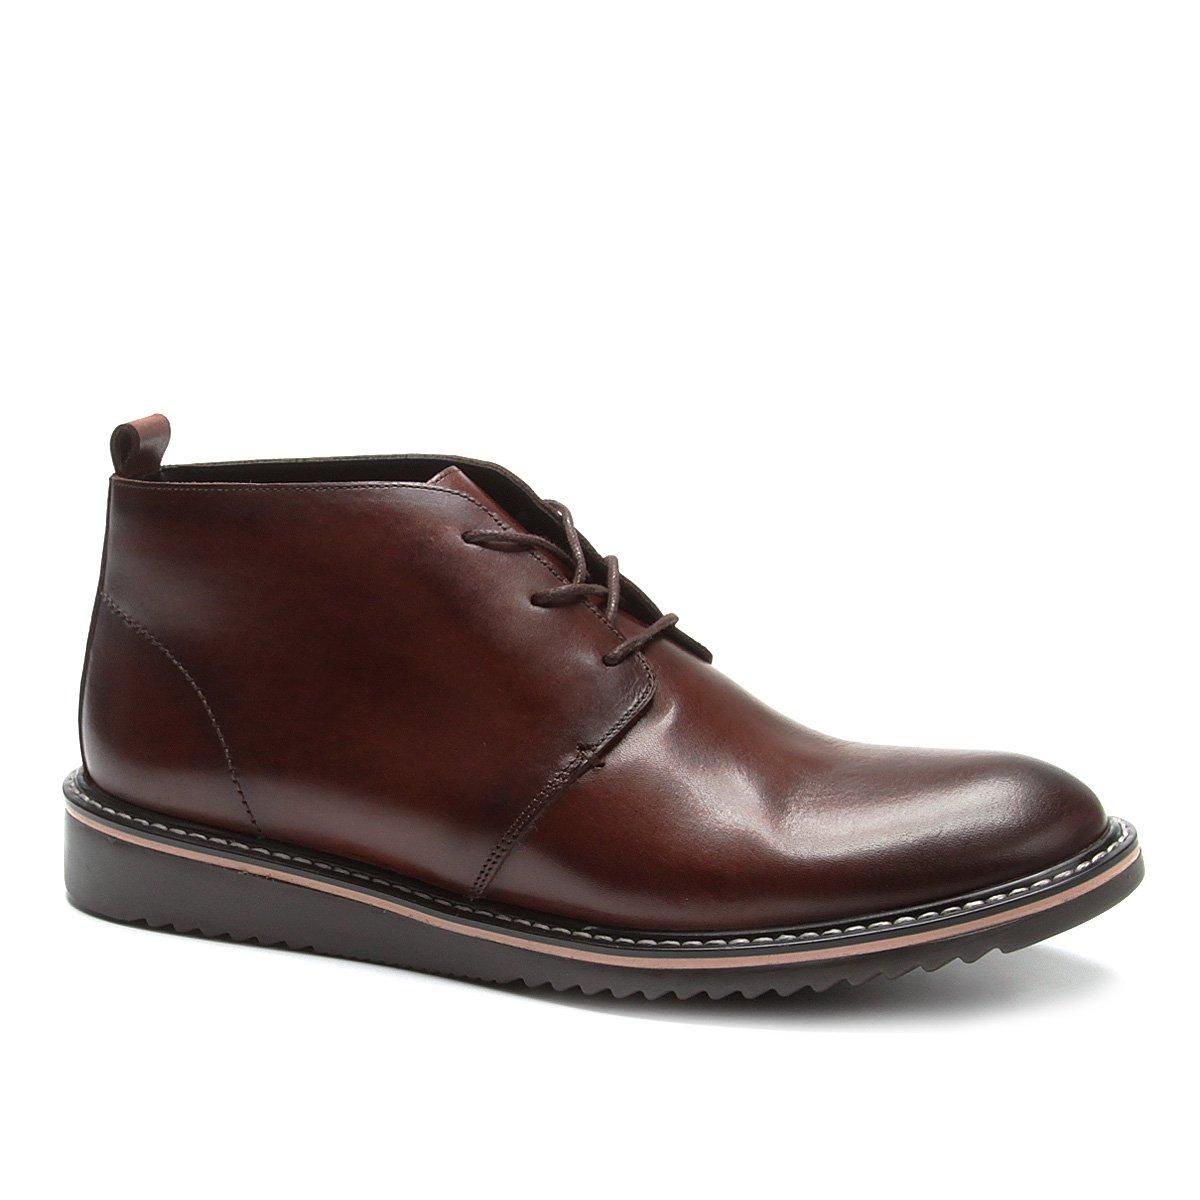 Shoestock Bota Bota COURO CANO Bota COURO CANO Marrom Shoestock CURTO CURTO Marrom 7HxwnqSwa0